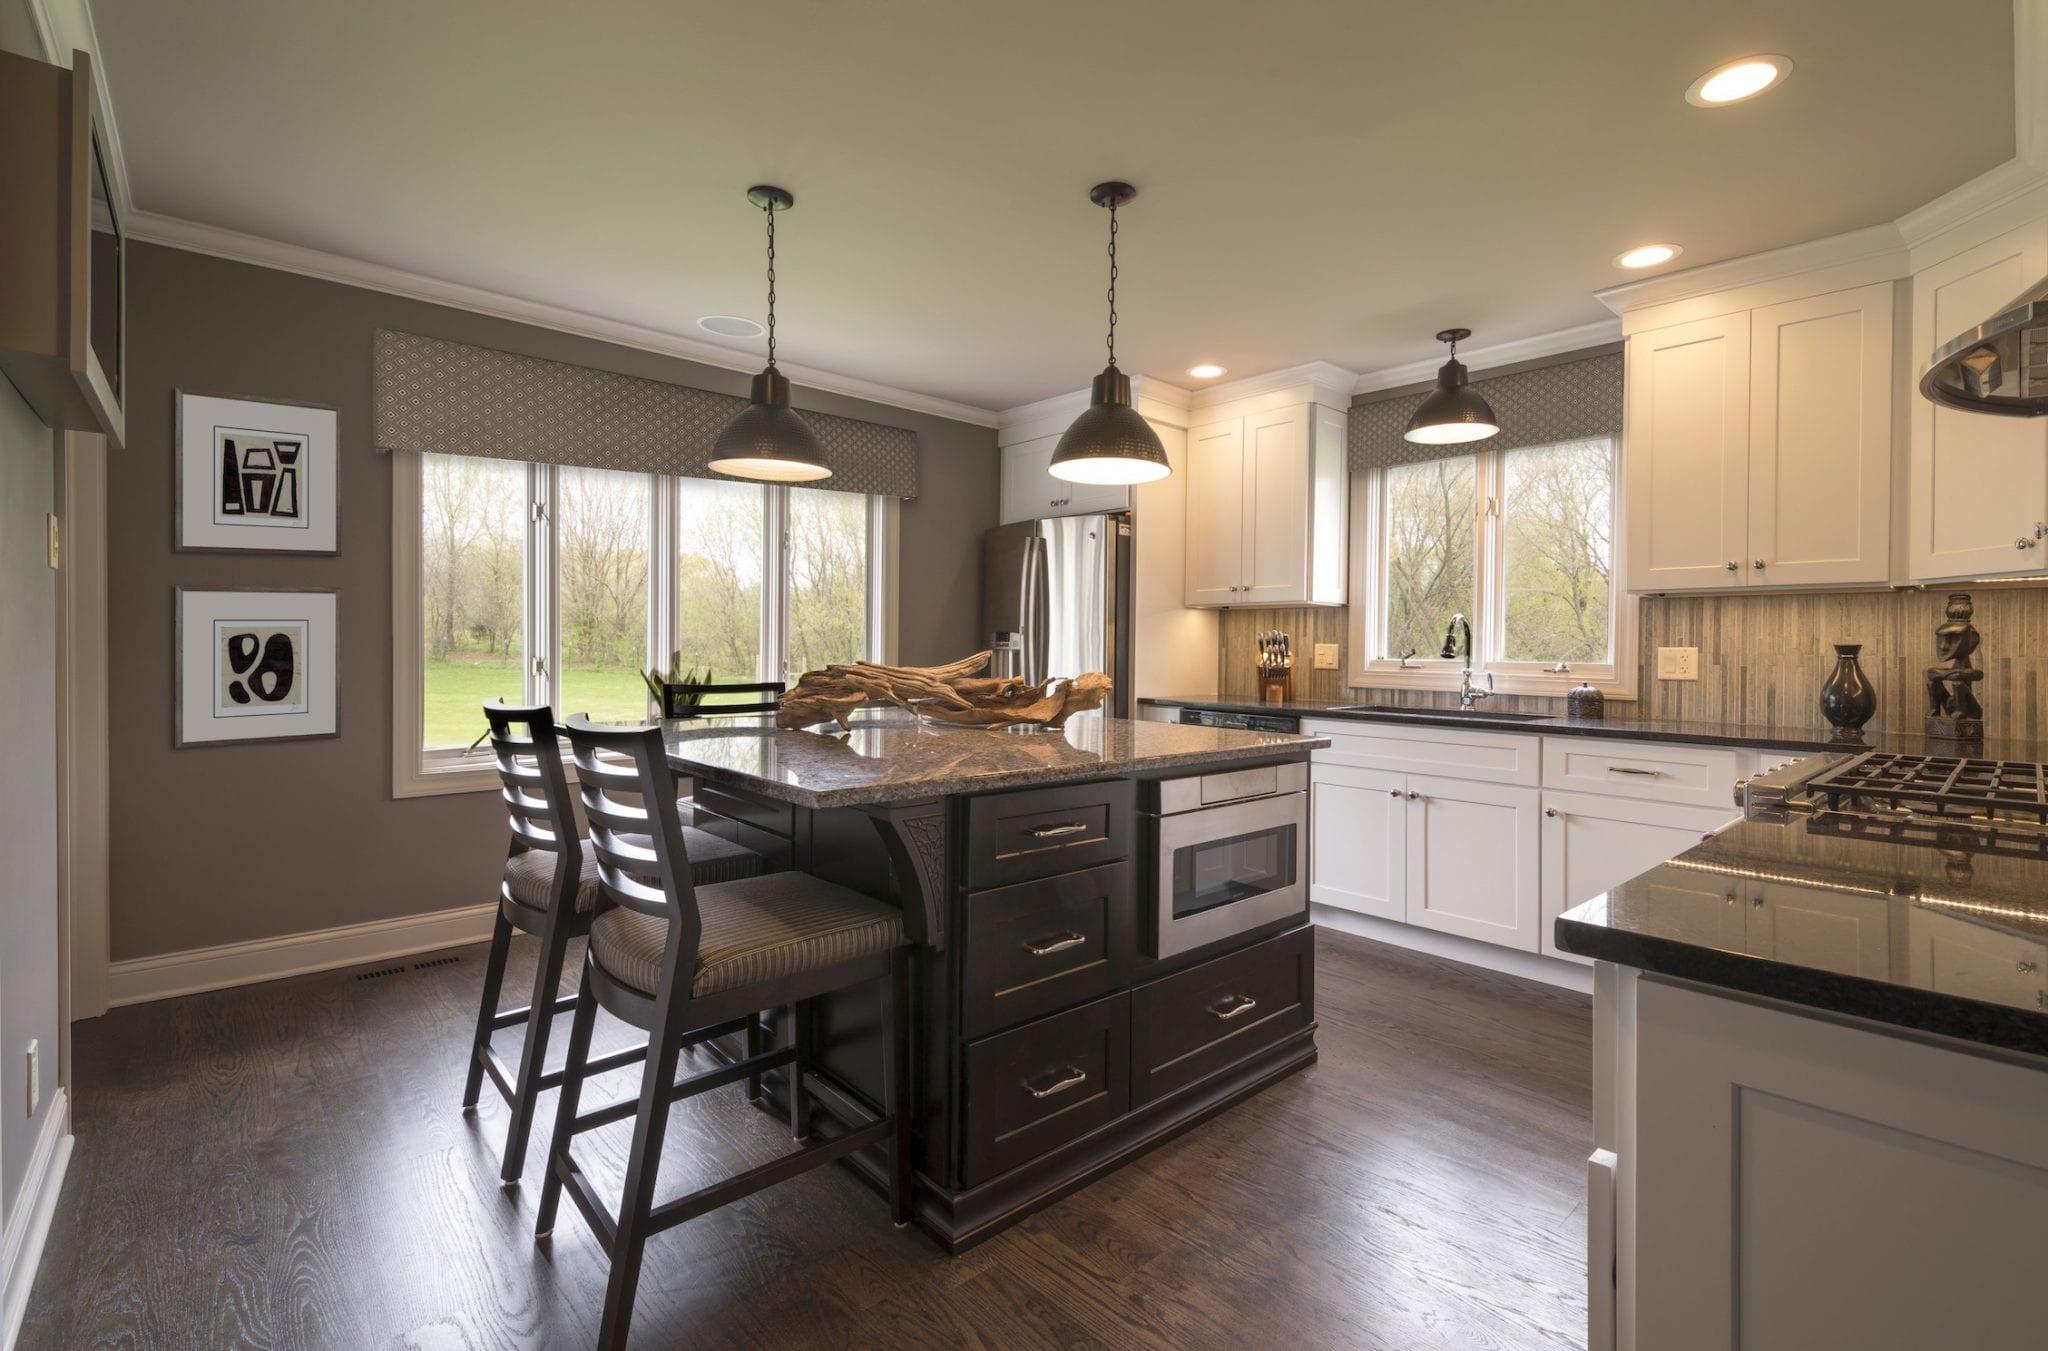 Crystal Lake Kitchen Design & Build